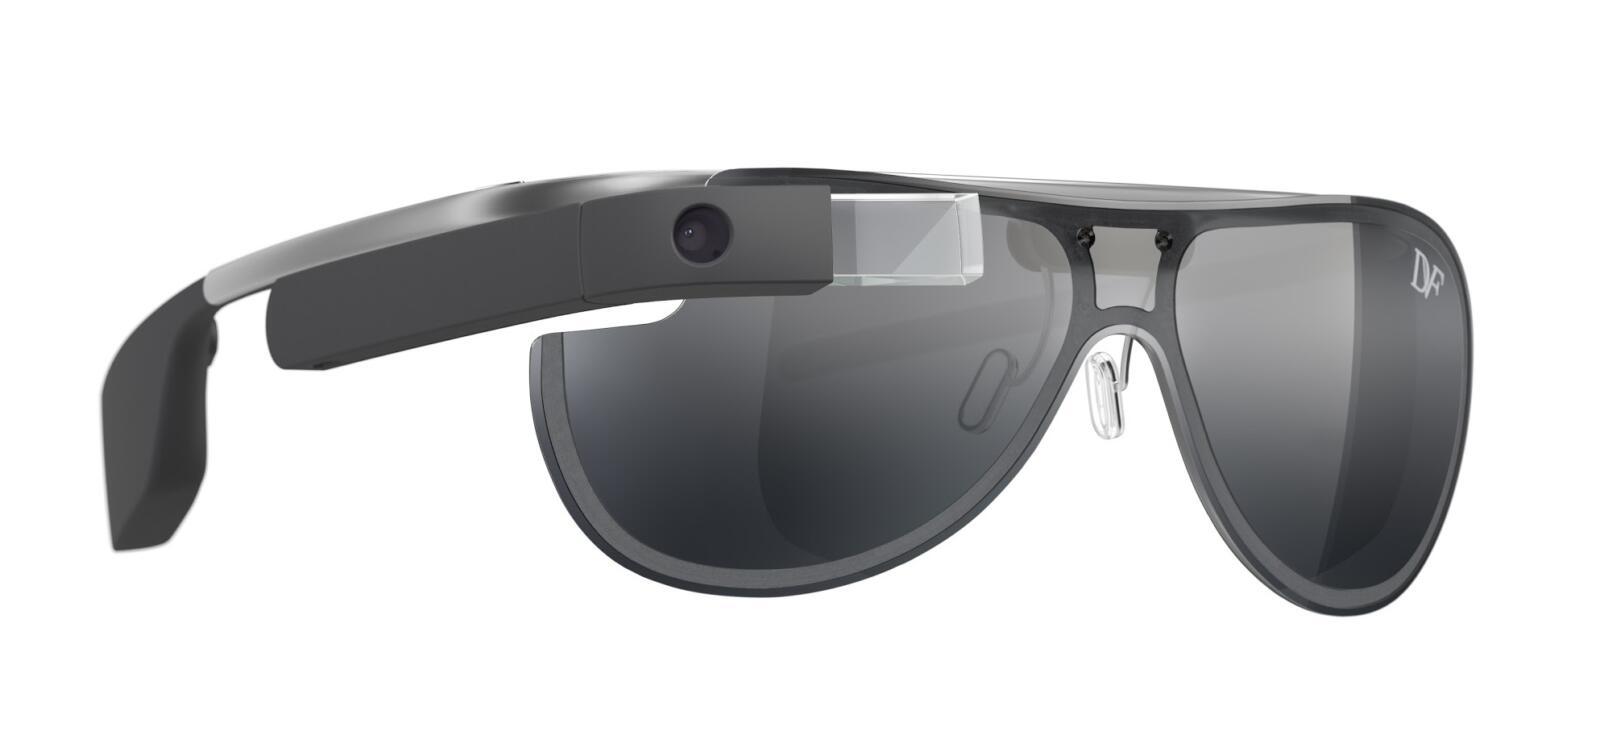 brille Glass Google tech